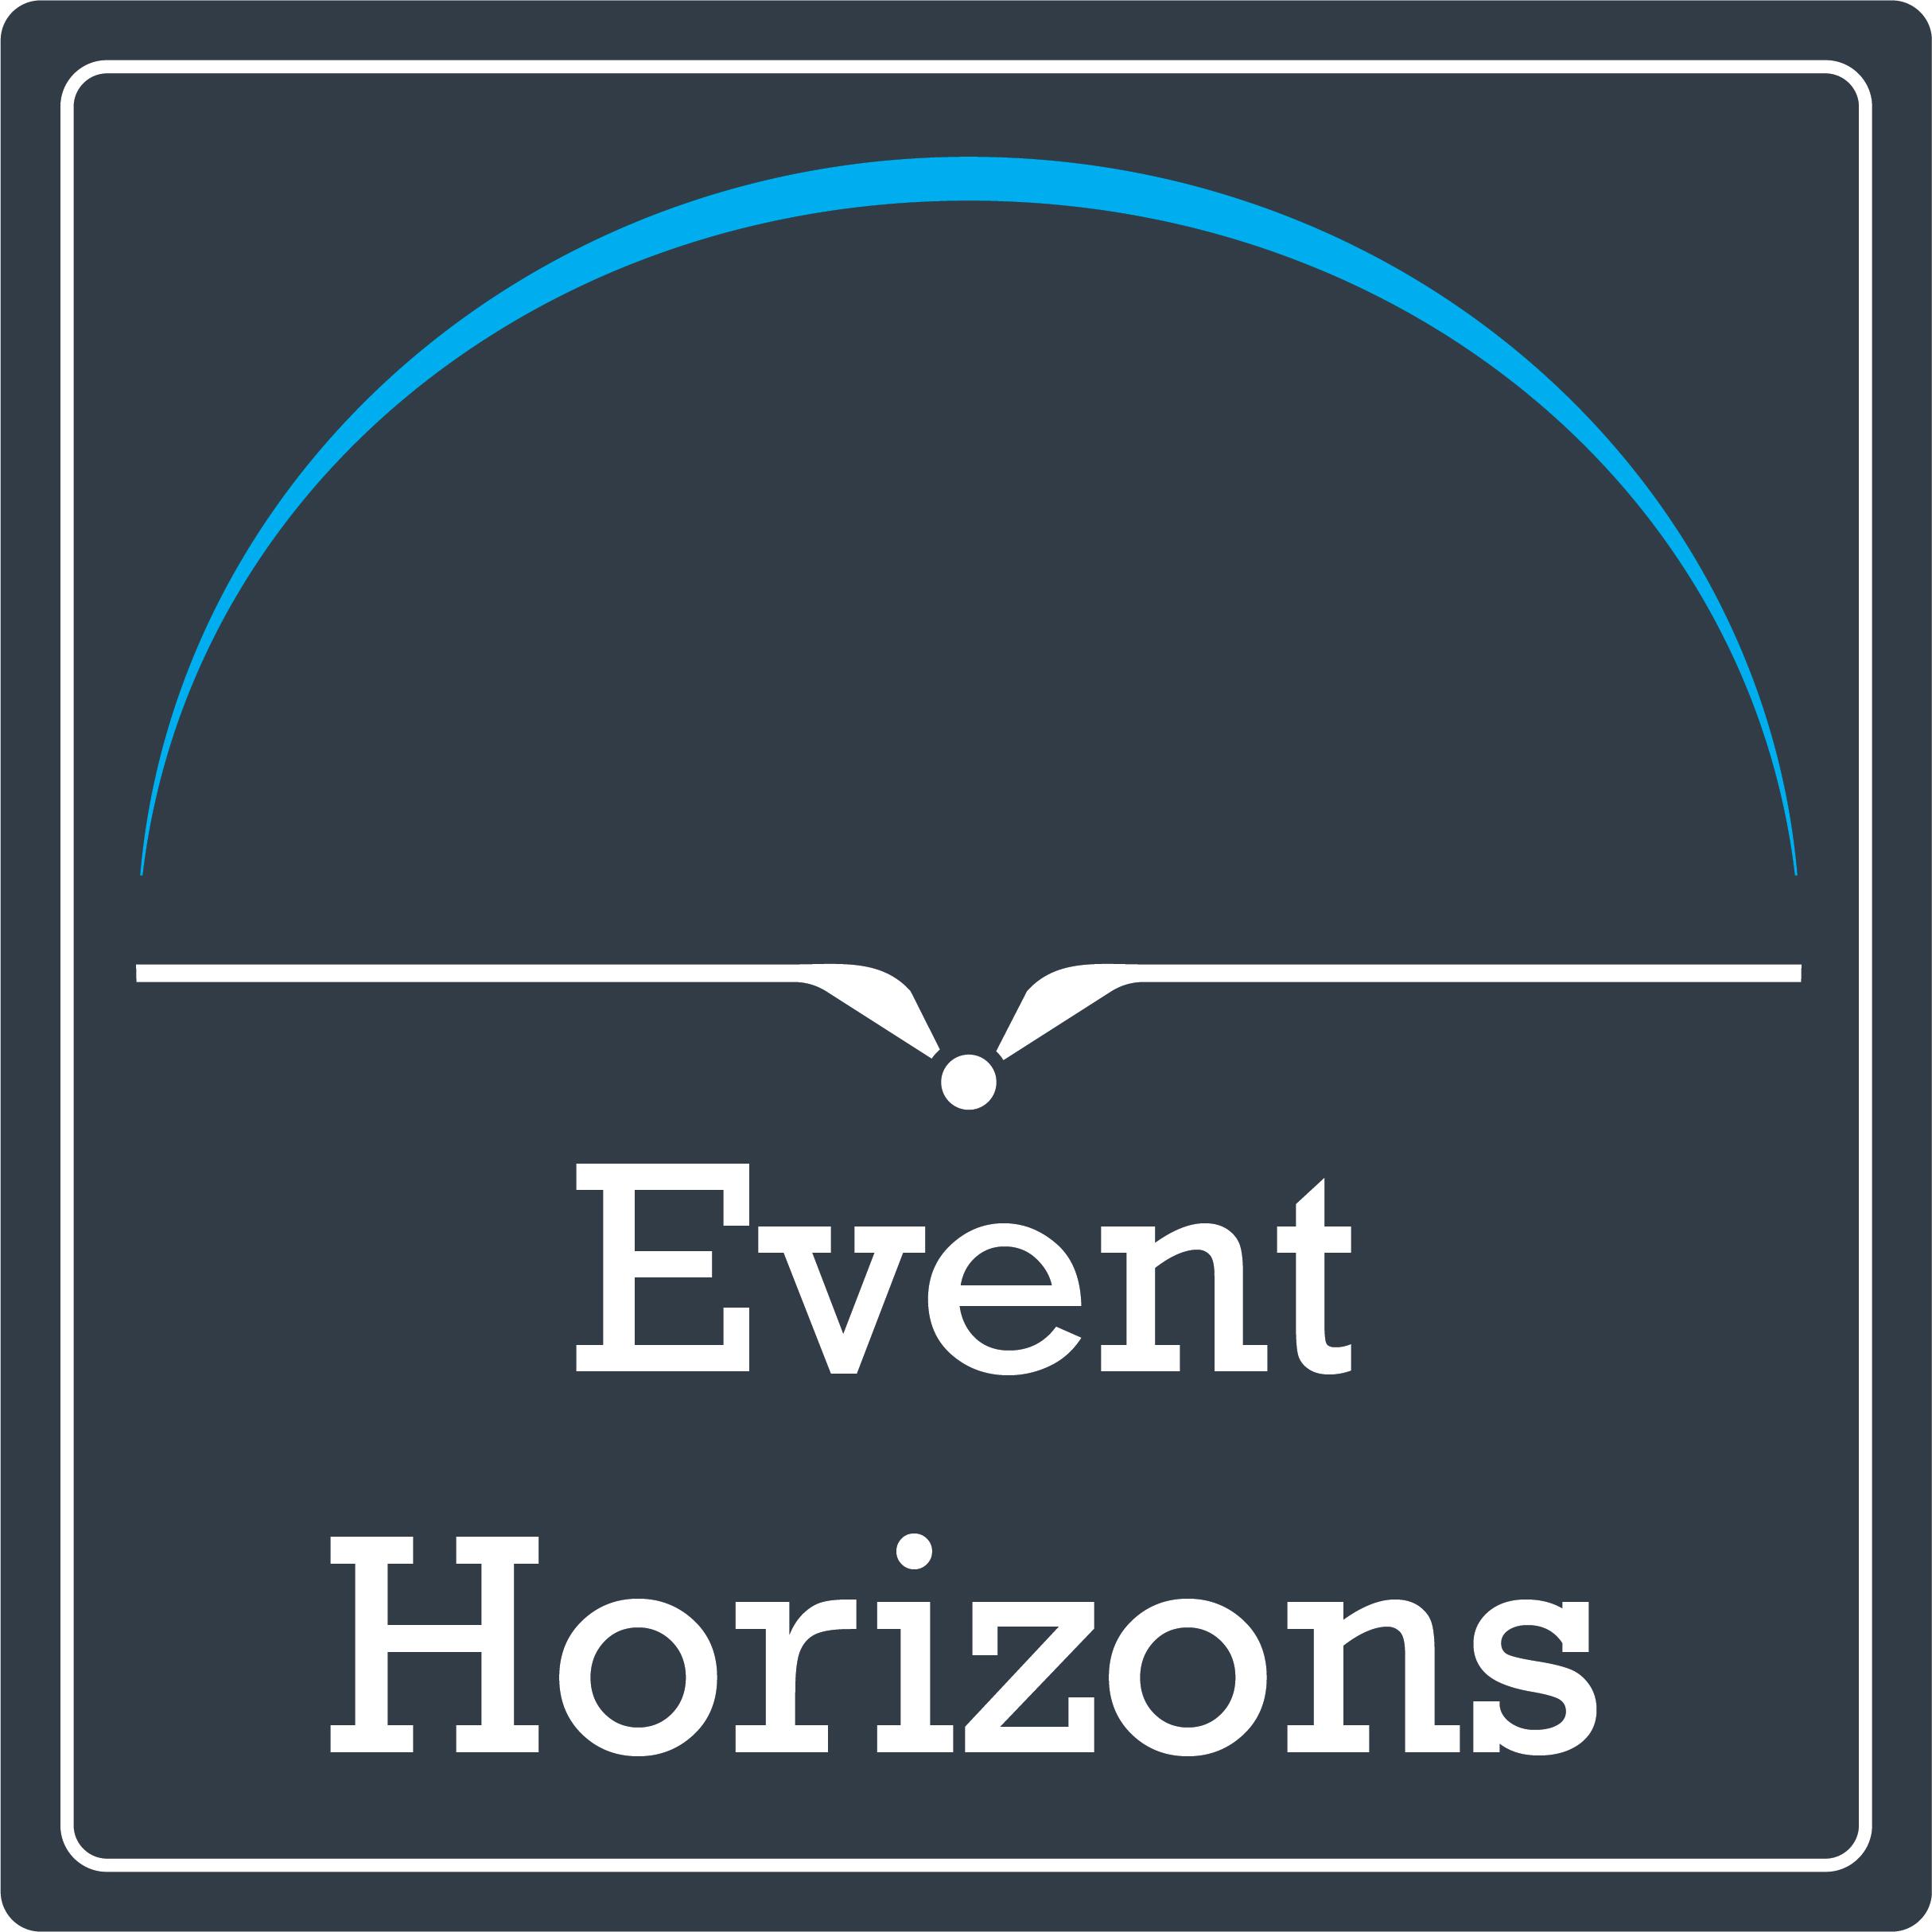 Event Horizons